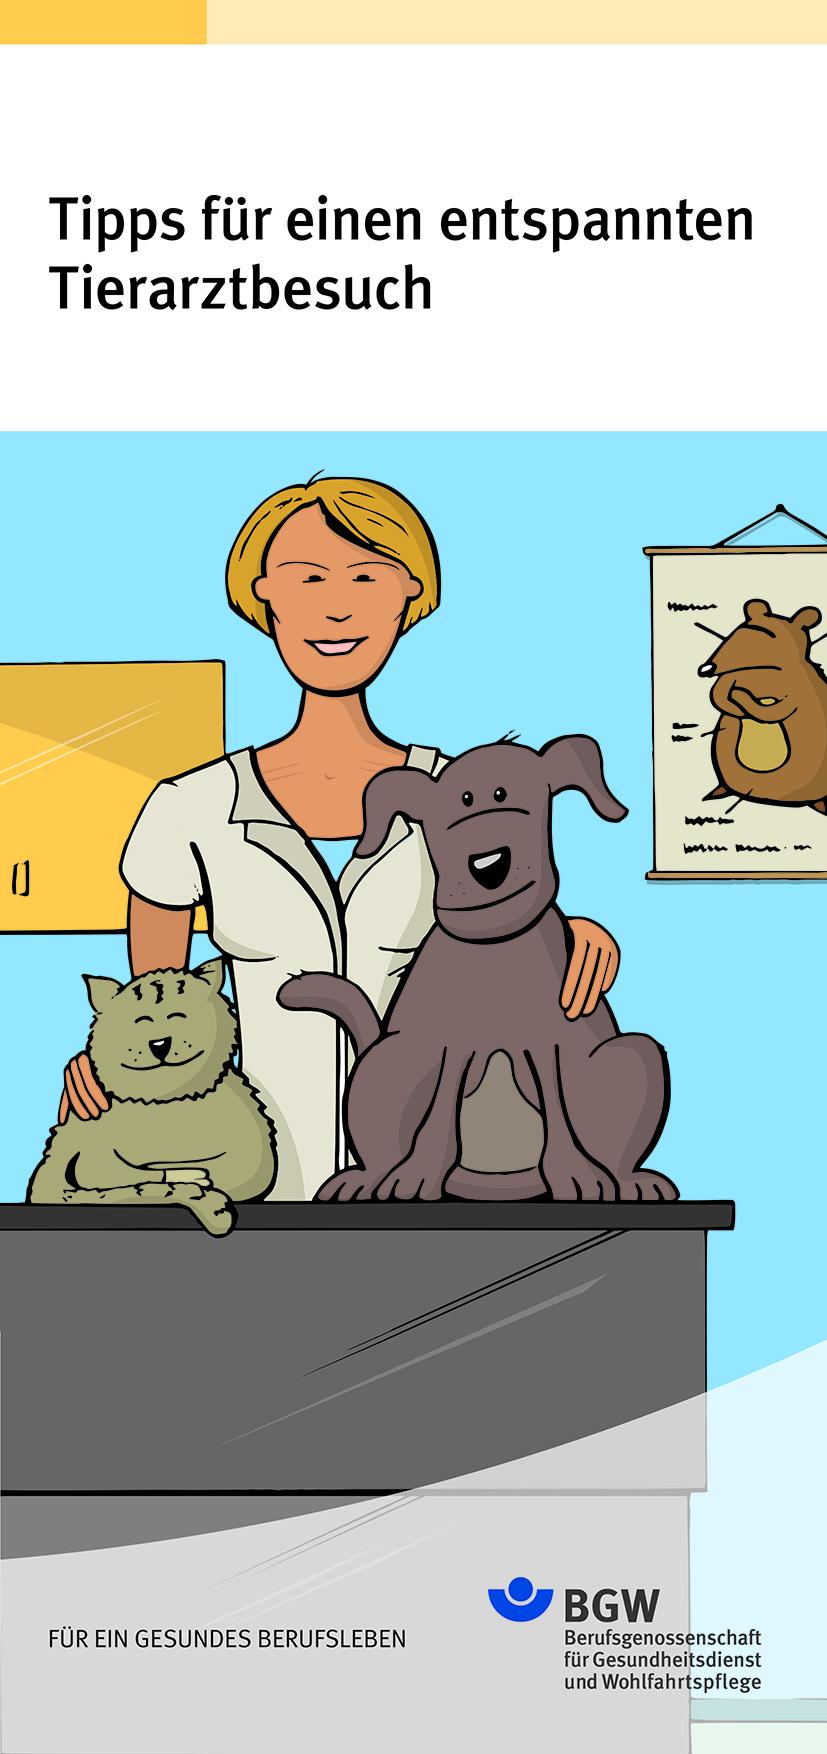 https://www.bgw-online.de/SharedDocs/Downloads/DE/Presse/2020/PI-Tierarztbesuch-Flyer-download.jpg?__blob=publicationFile